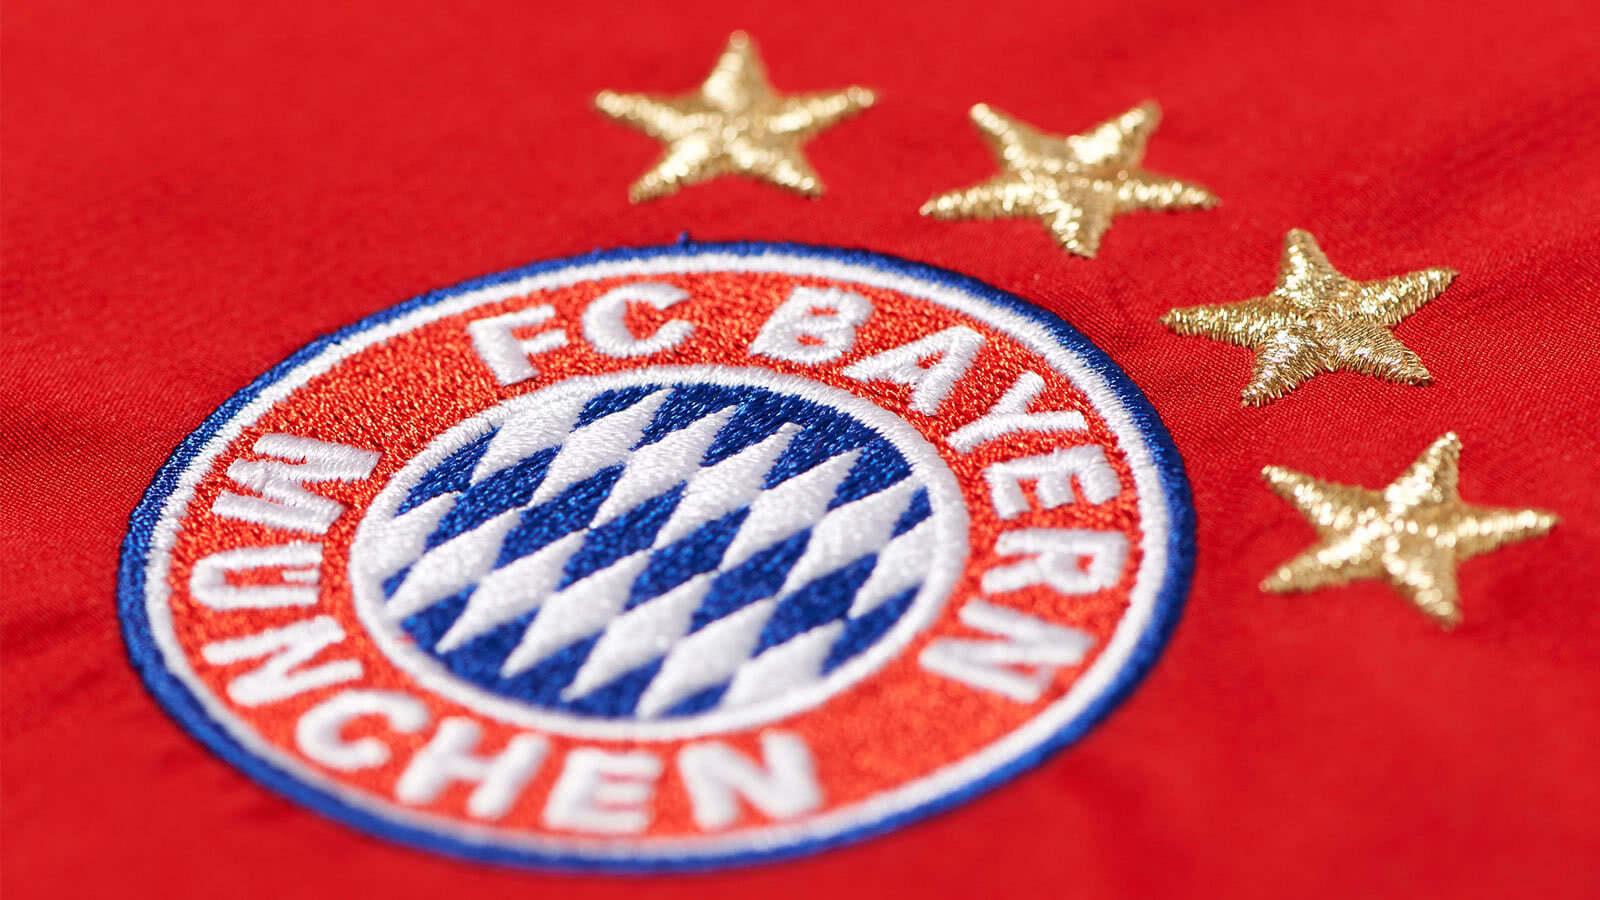 FC Bayern Trikot kaufe